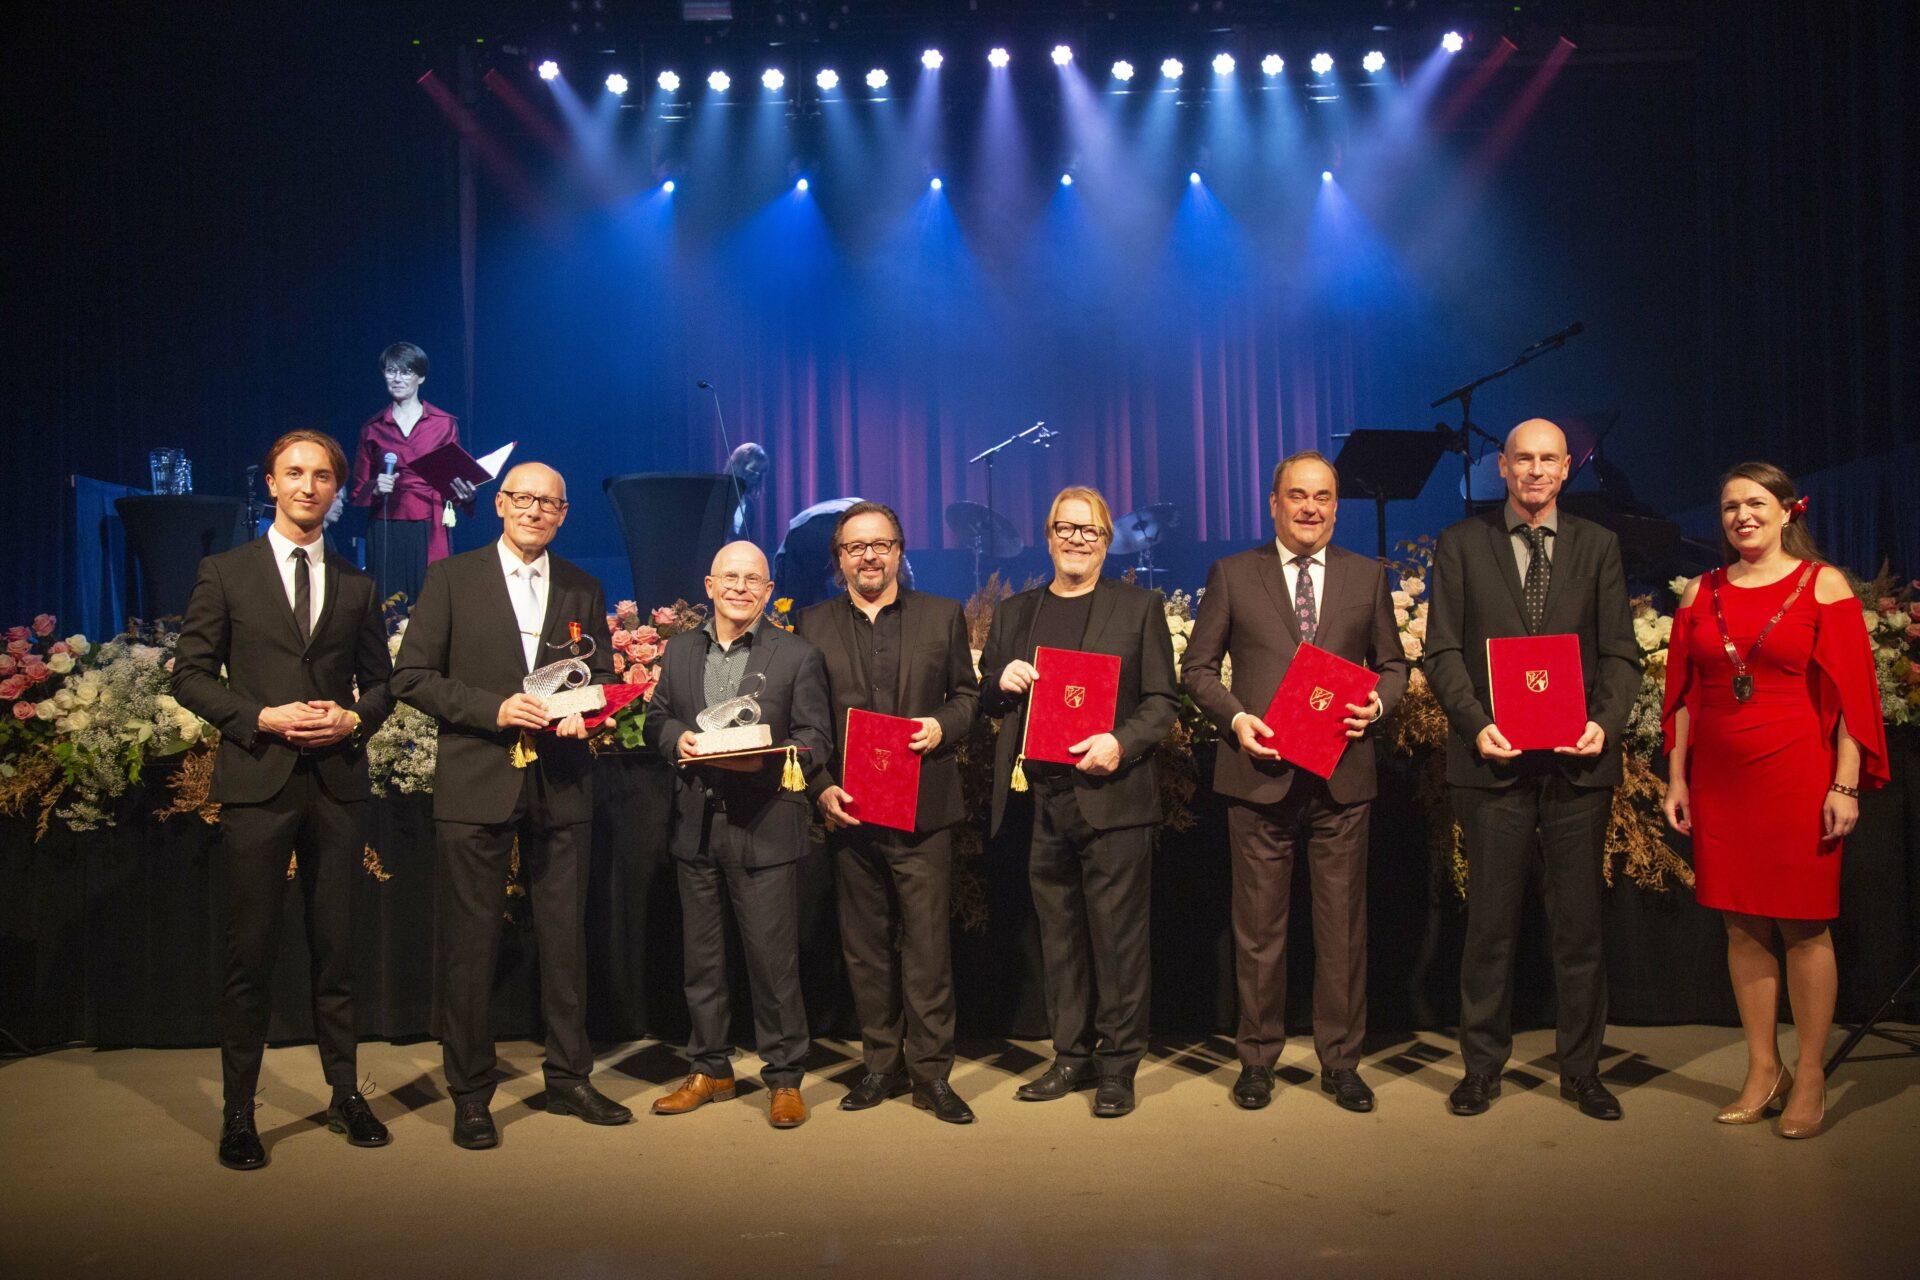 Tampereen päivän palkintojen jako 2021